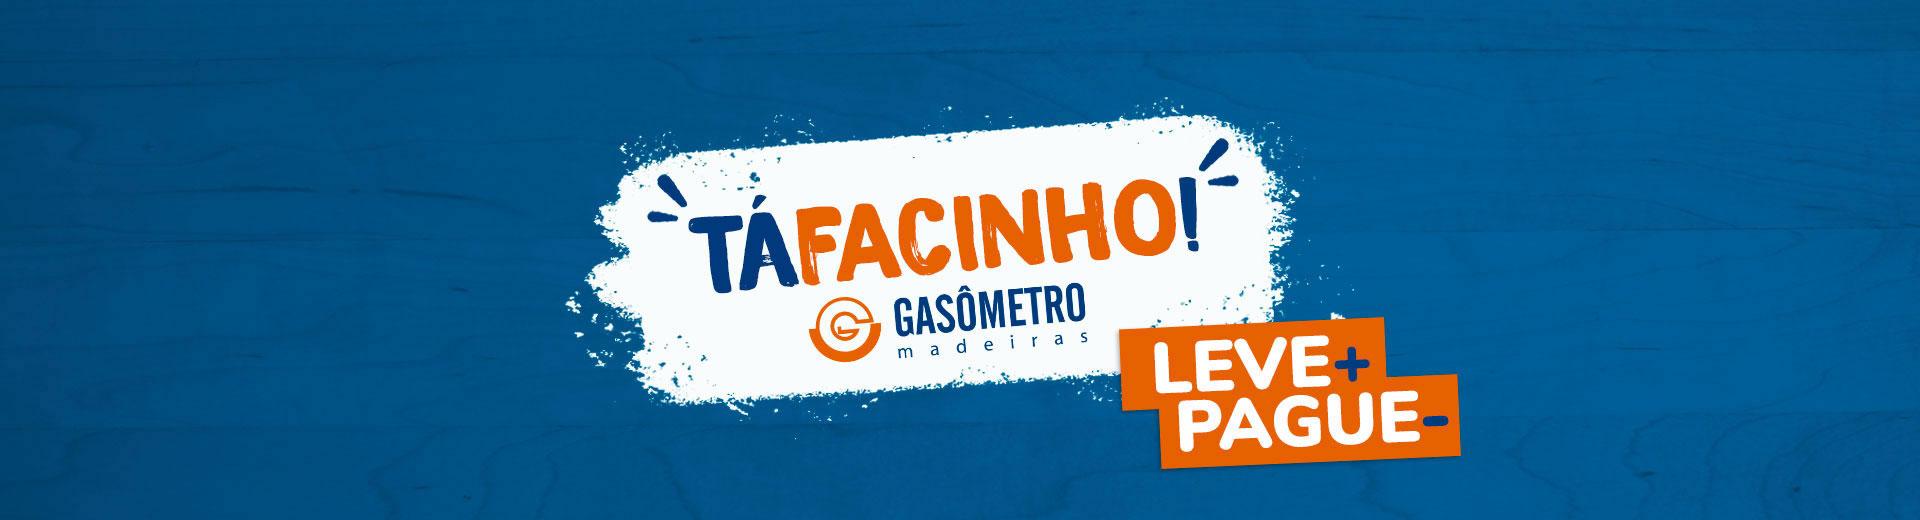 #TáFacinho!